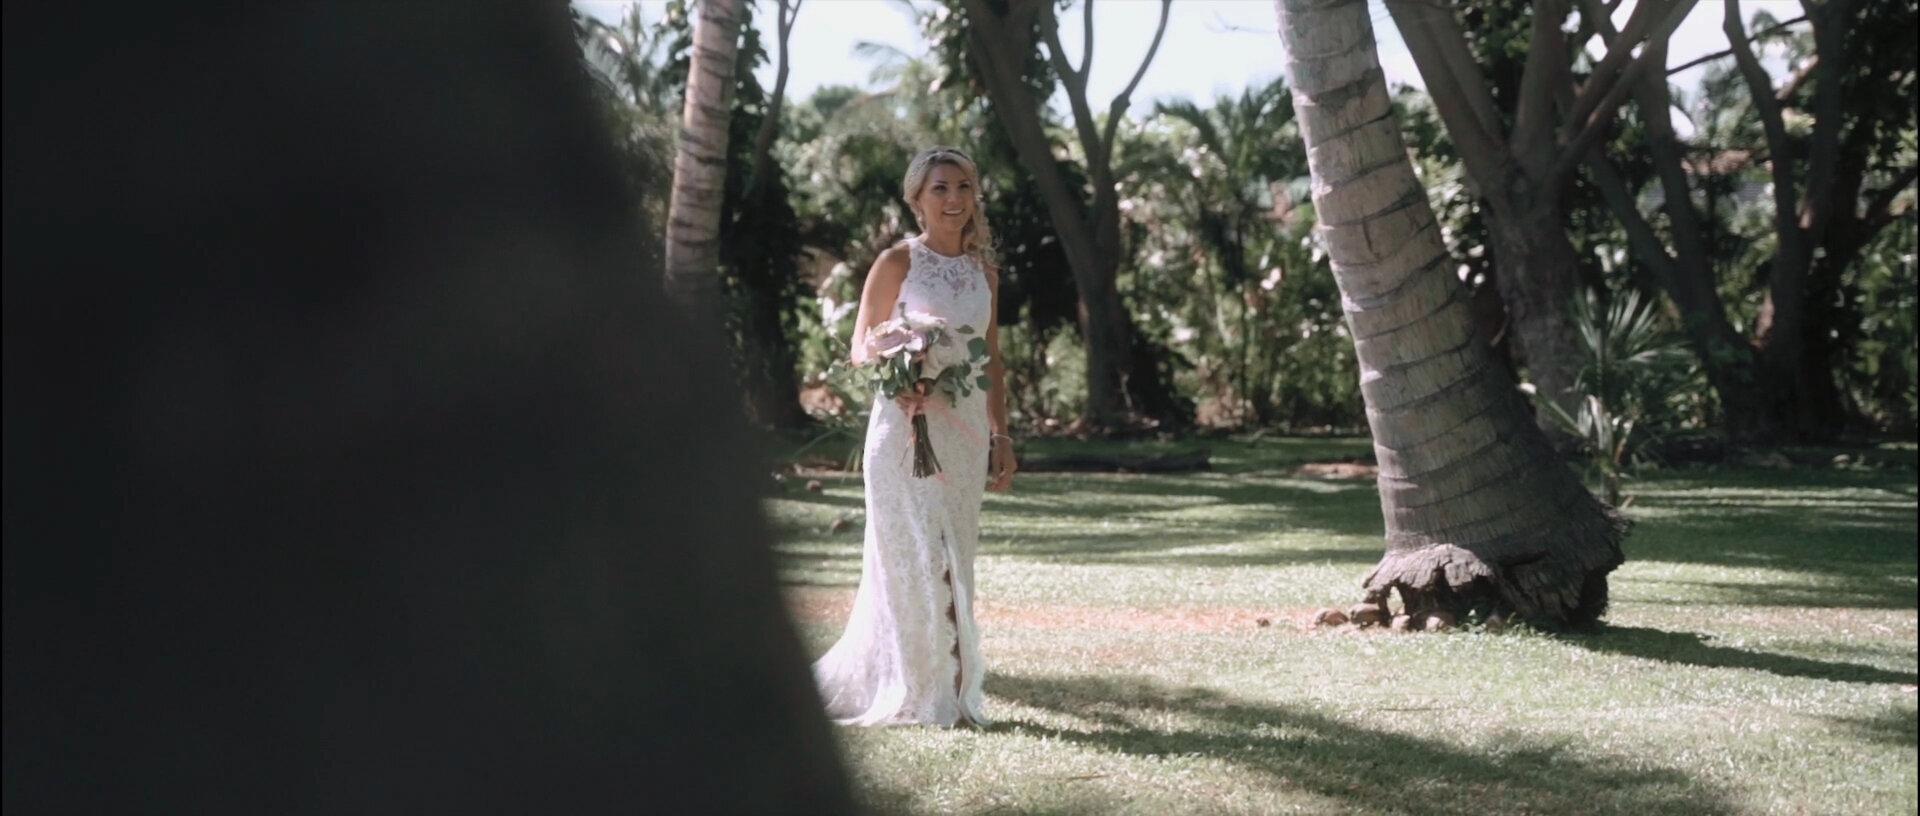 olowalu-plantation-house-wedding-venue-oceanfront-4.jpg